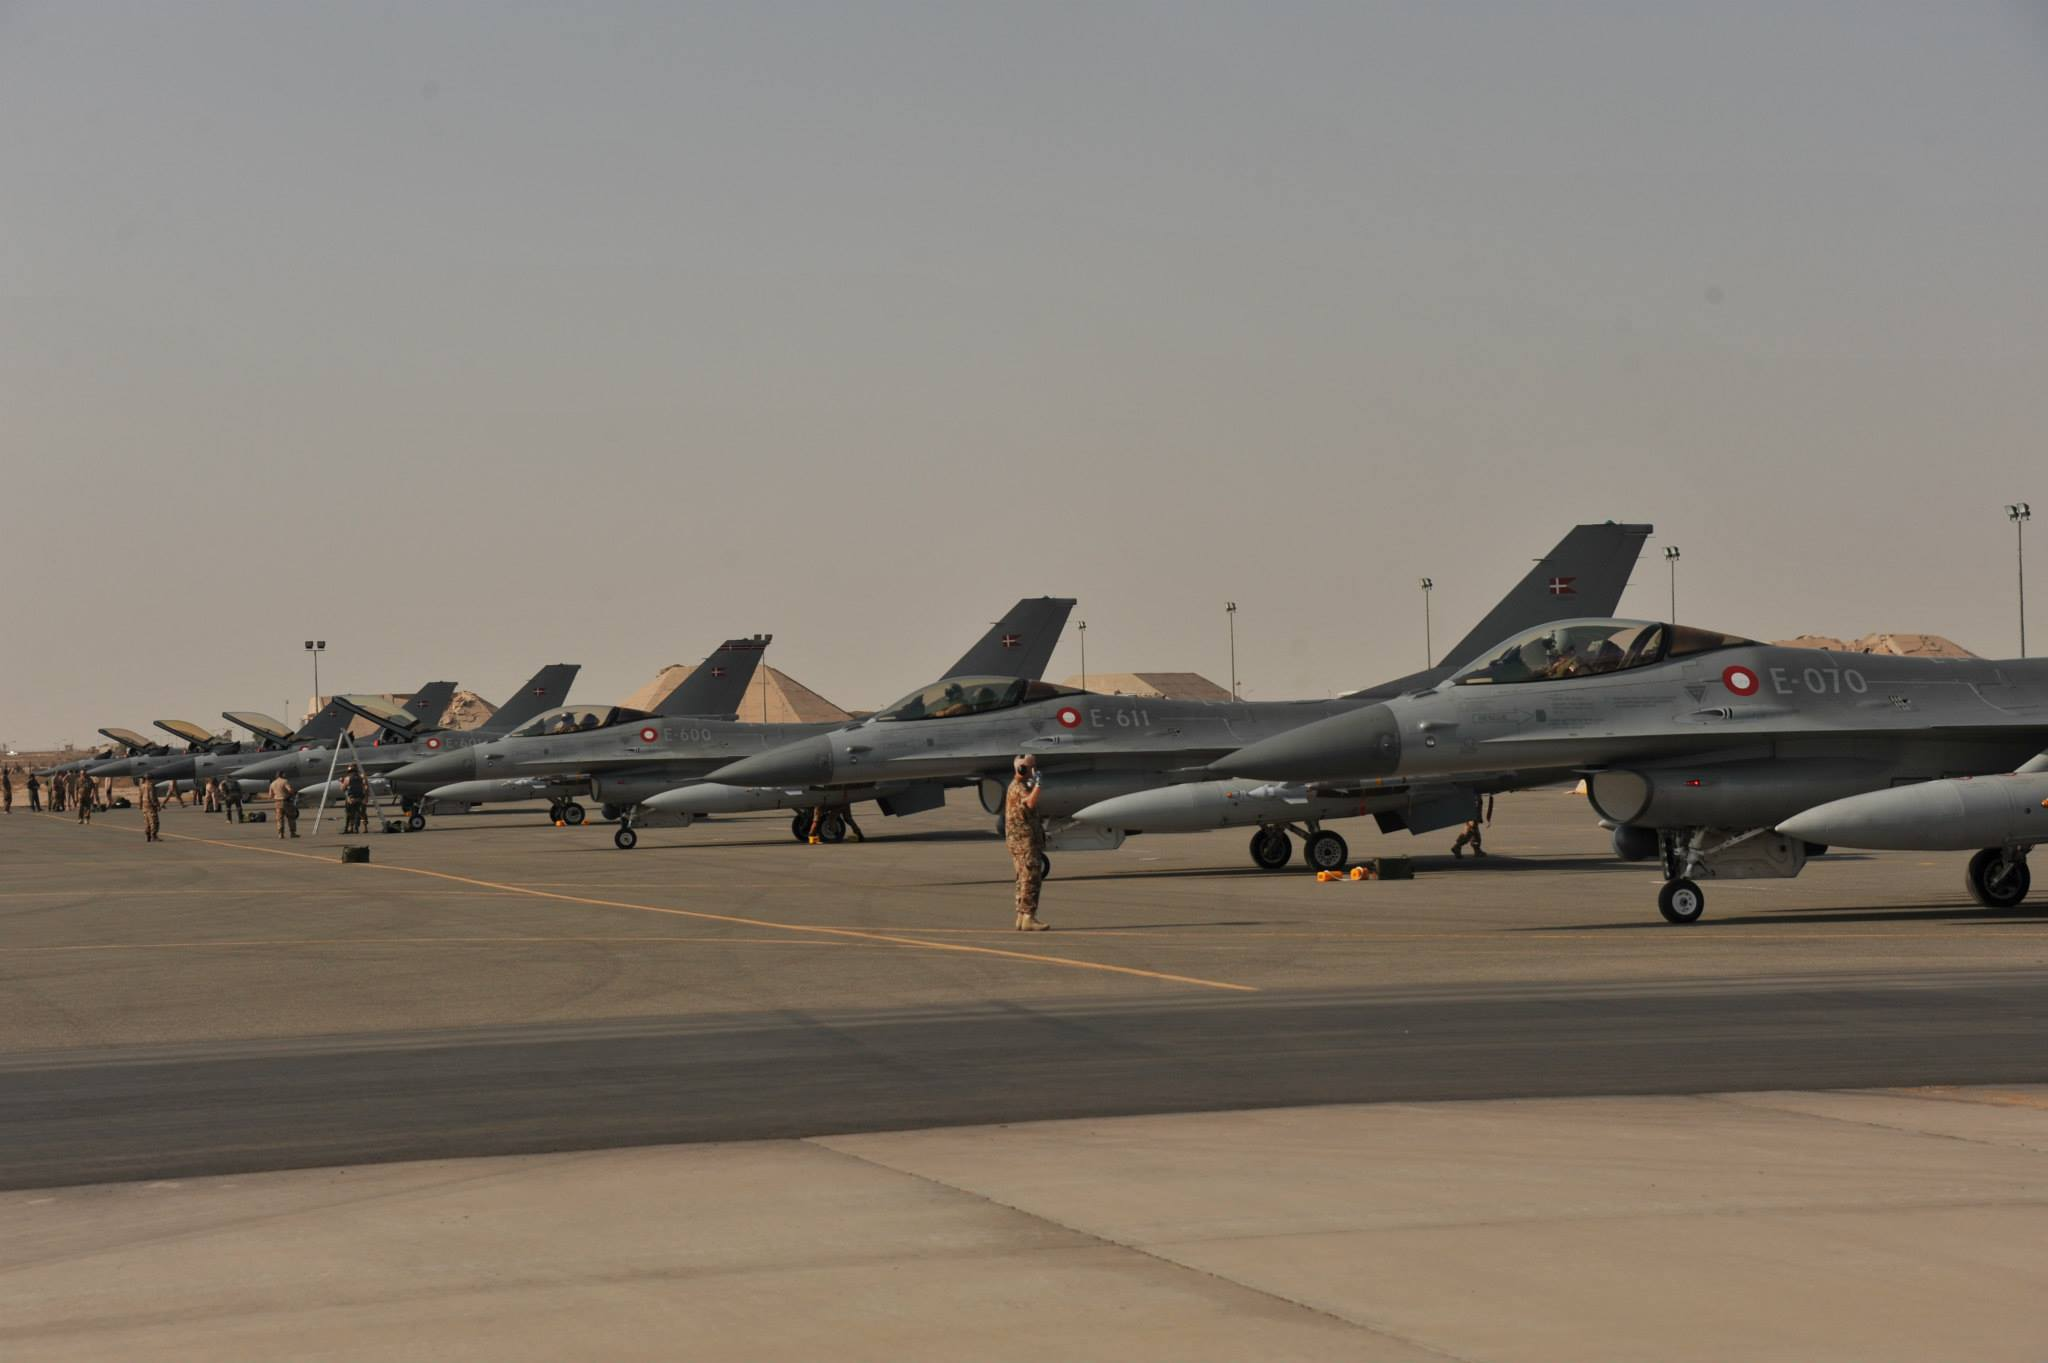 Squadron of Danish F-16s in Kuwait, early October 2014 (Flyvevåbnet/ Ahmad al-Jabar)